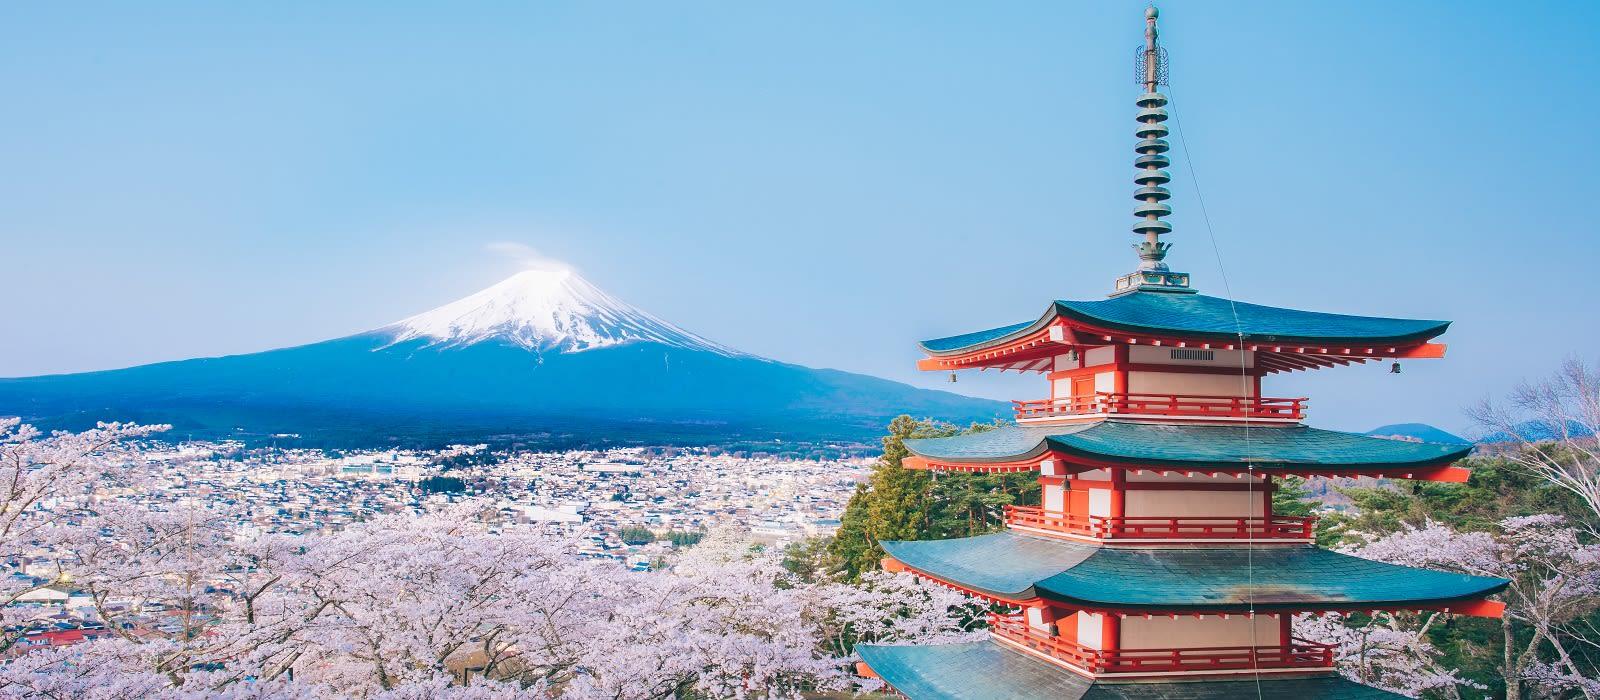 Japan's Hidden Treasures Tour Trip 1